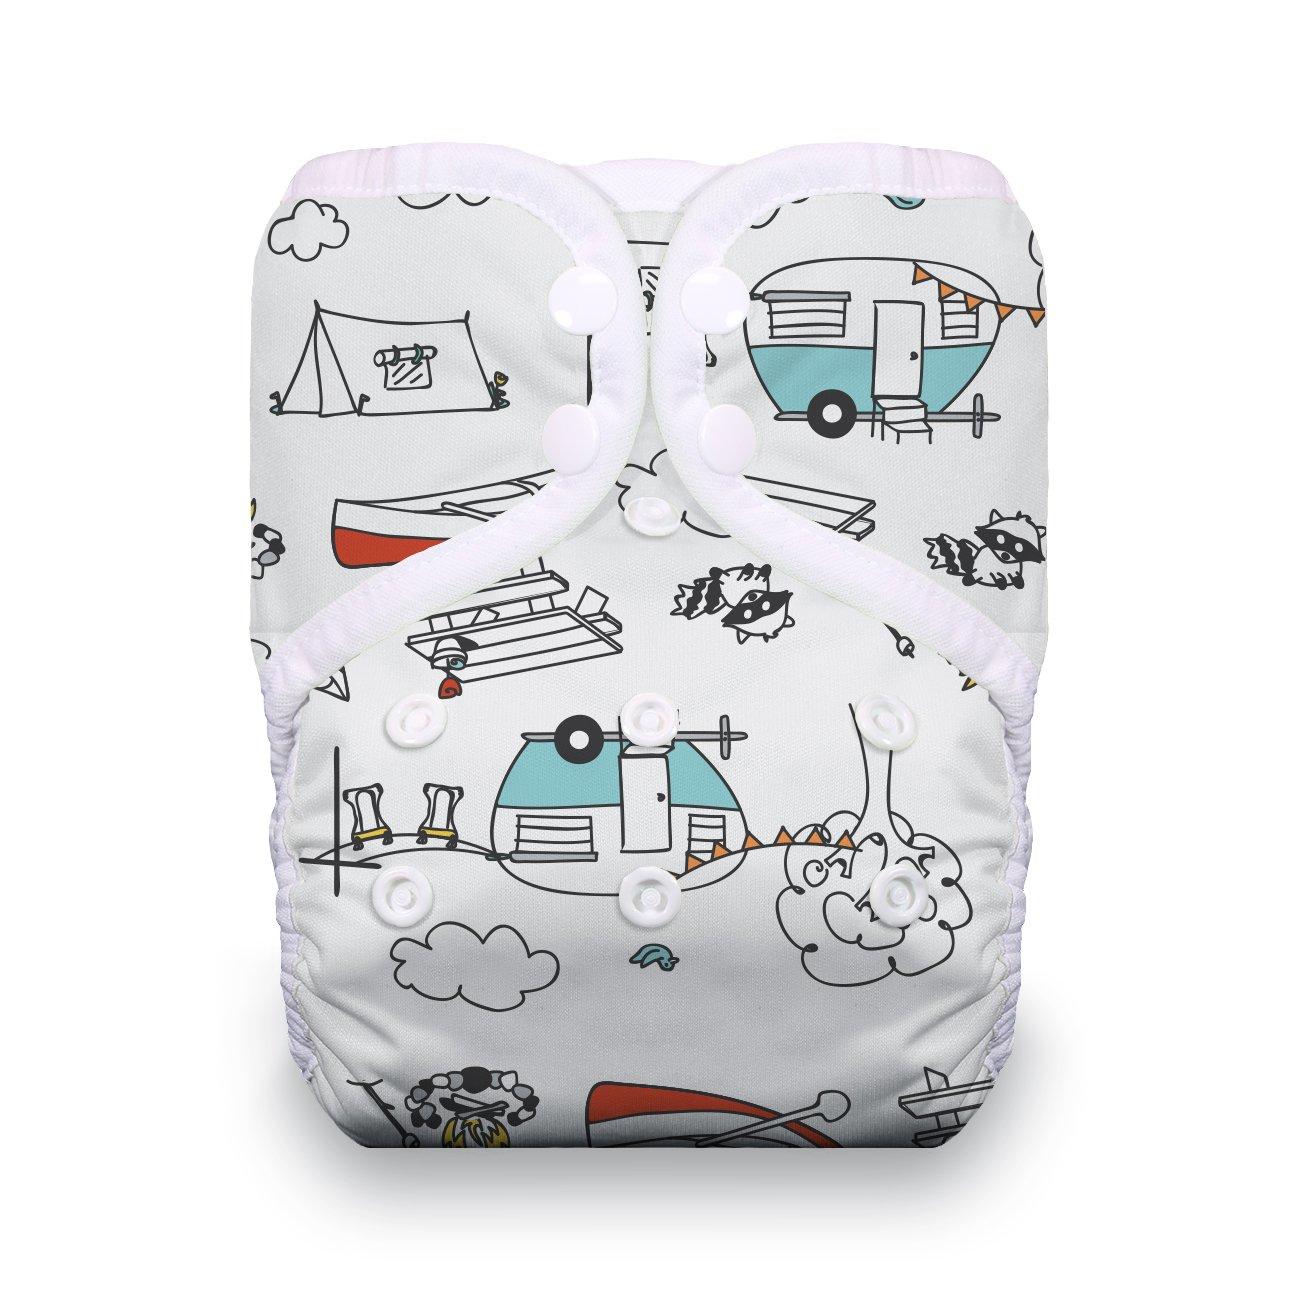 Snap Closure Thirsties Reusable Cloth Diaper One Size Pocket Diaper Adventure Trail